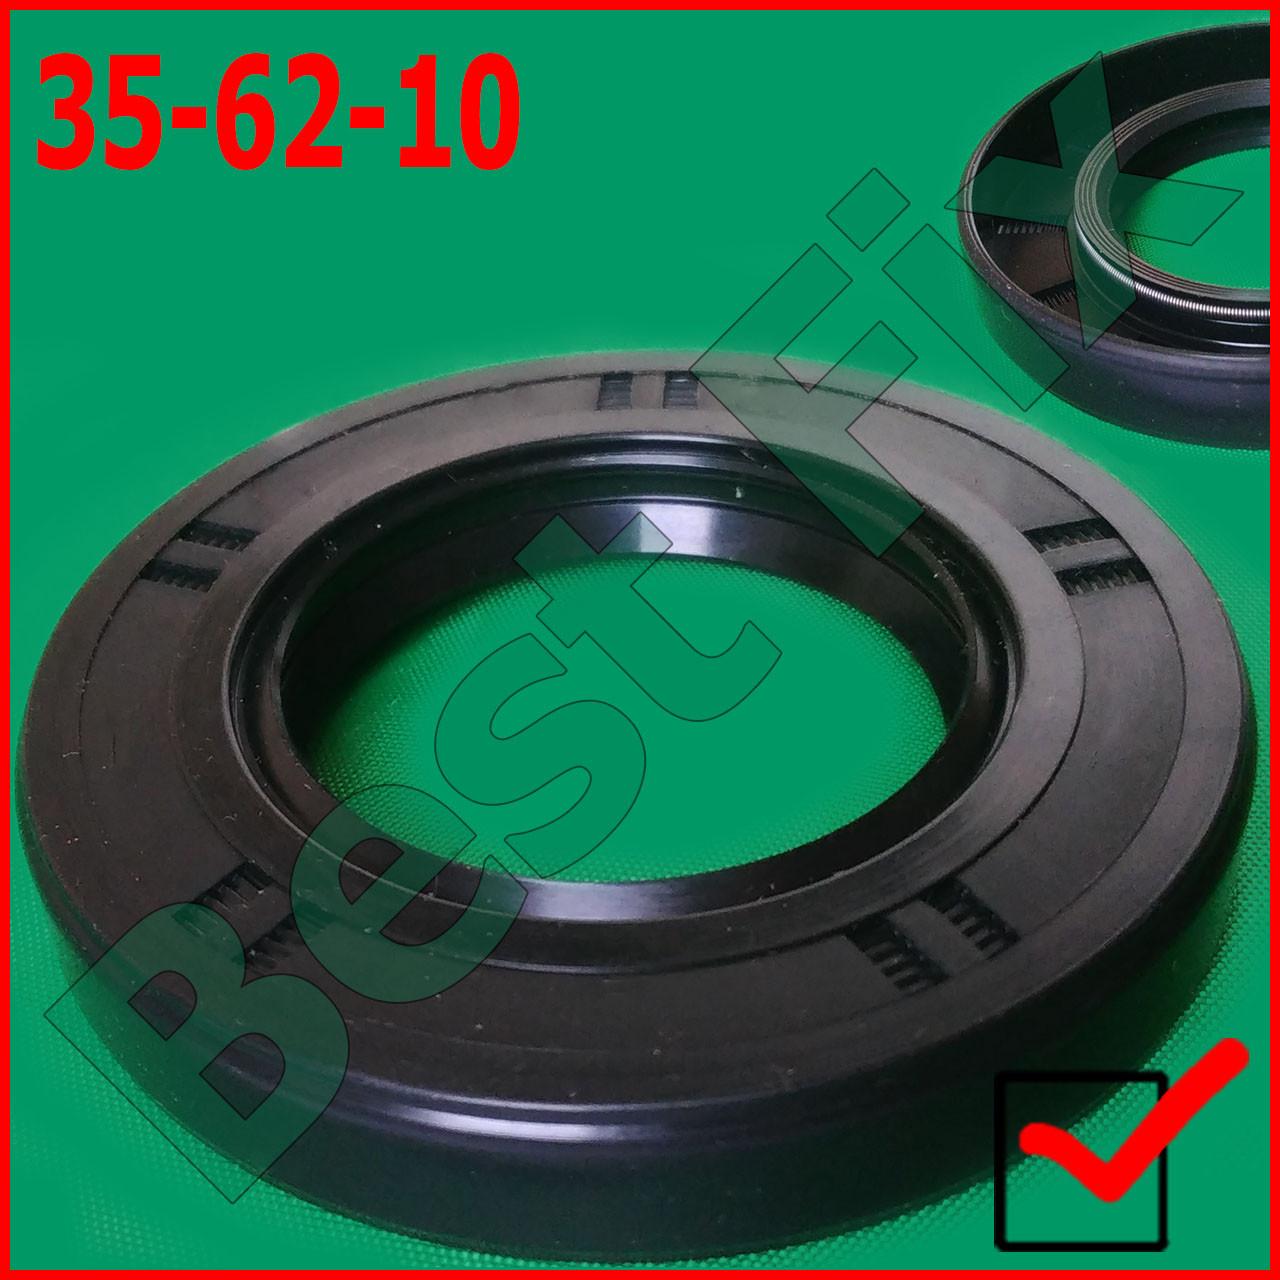 Сальник 35-62-10 GP WLK